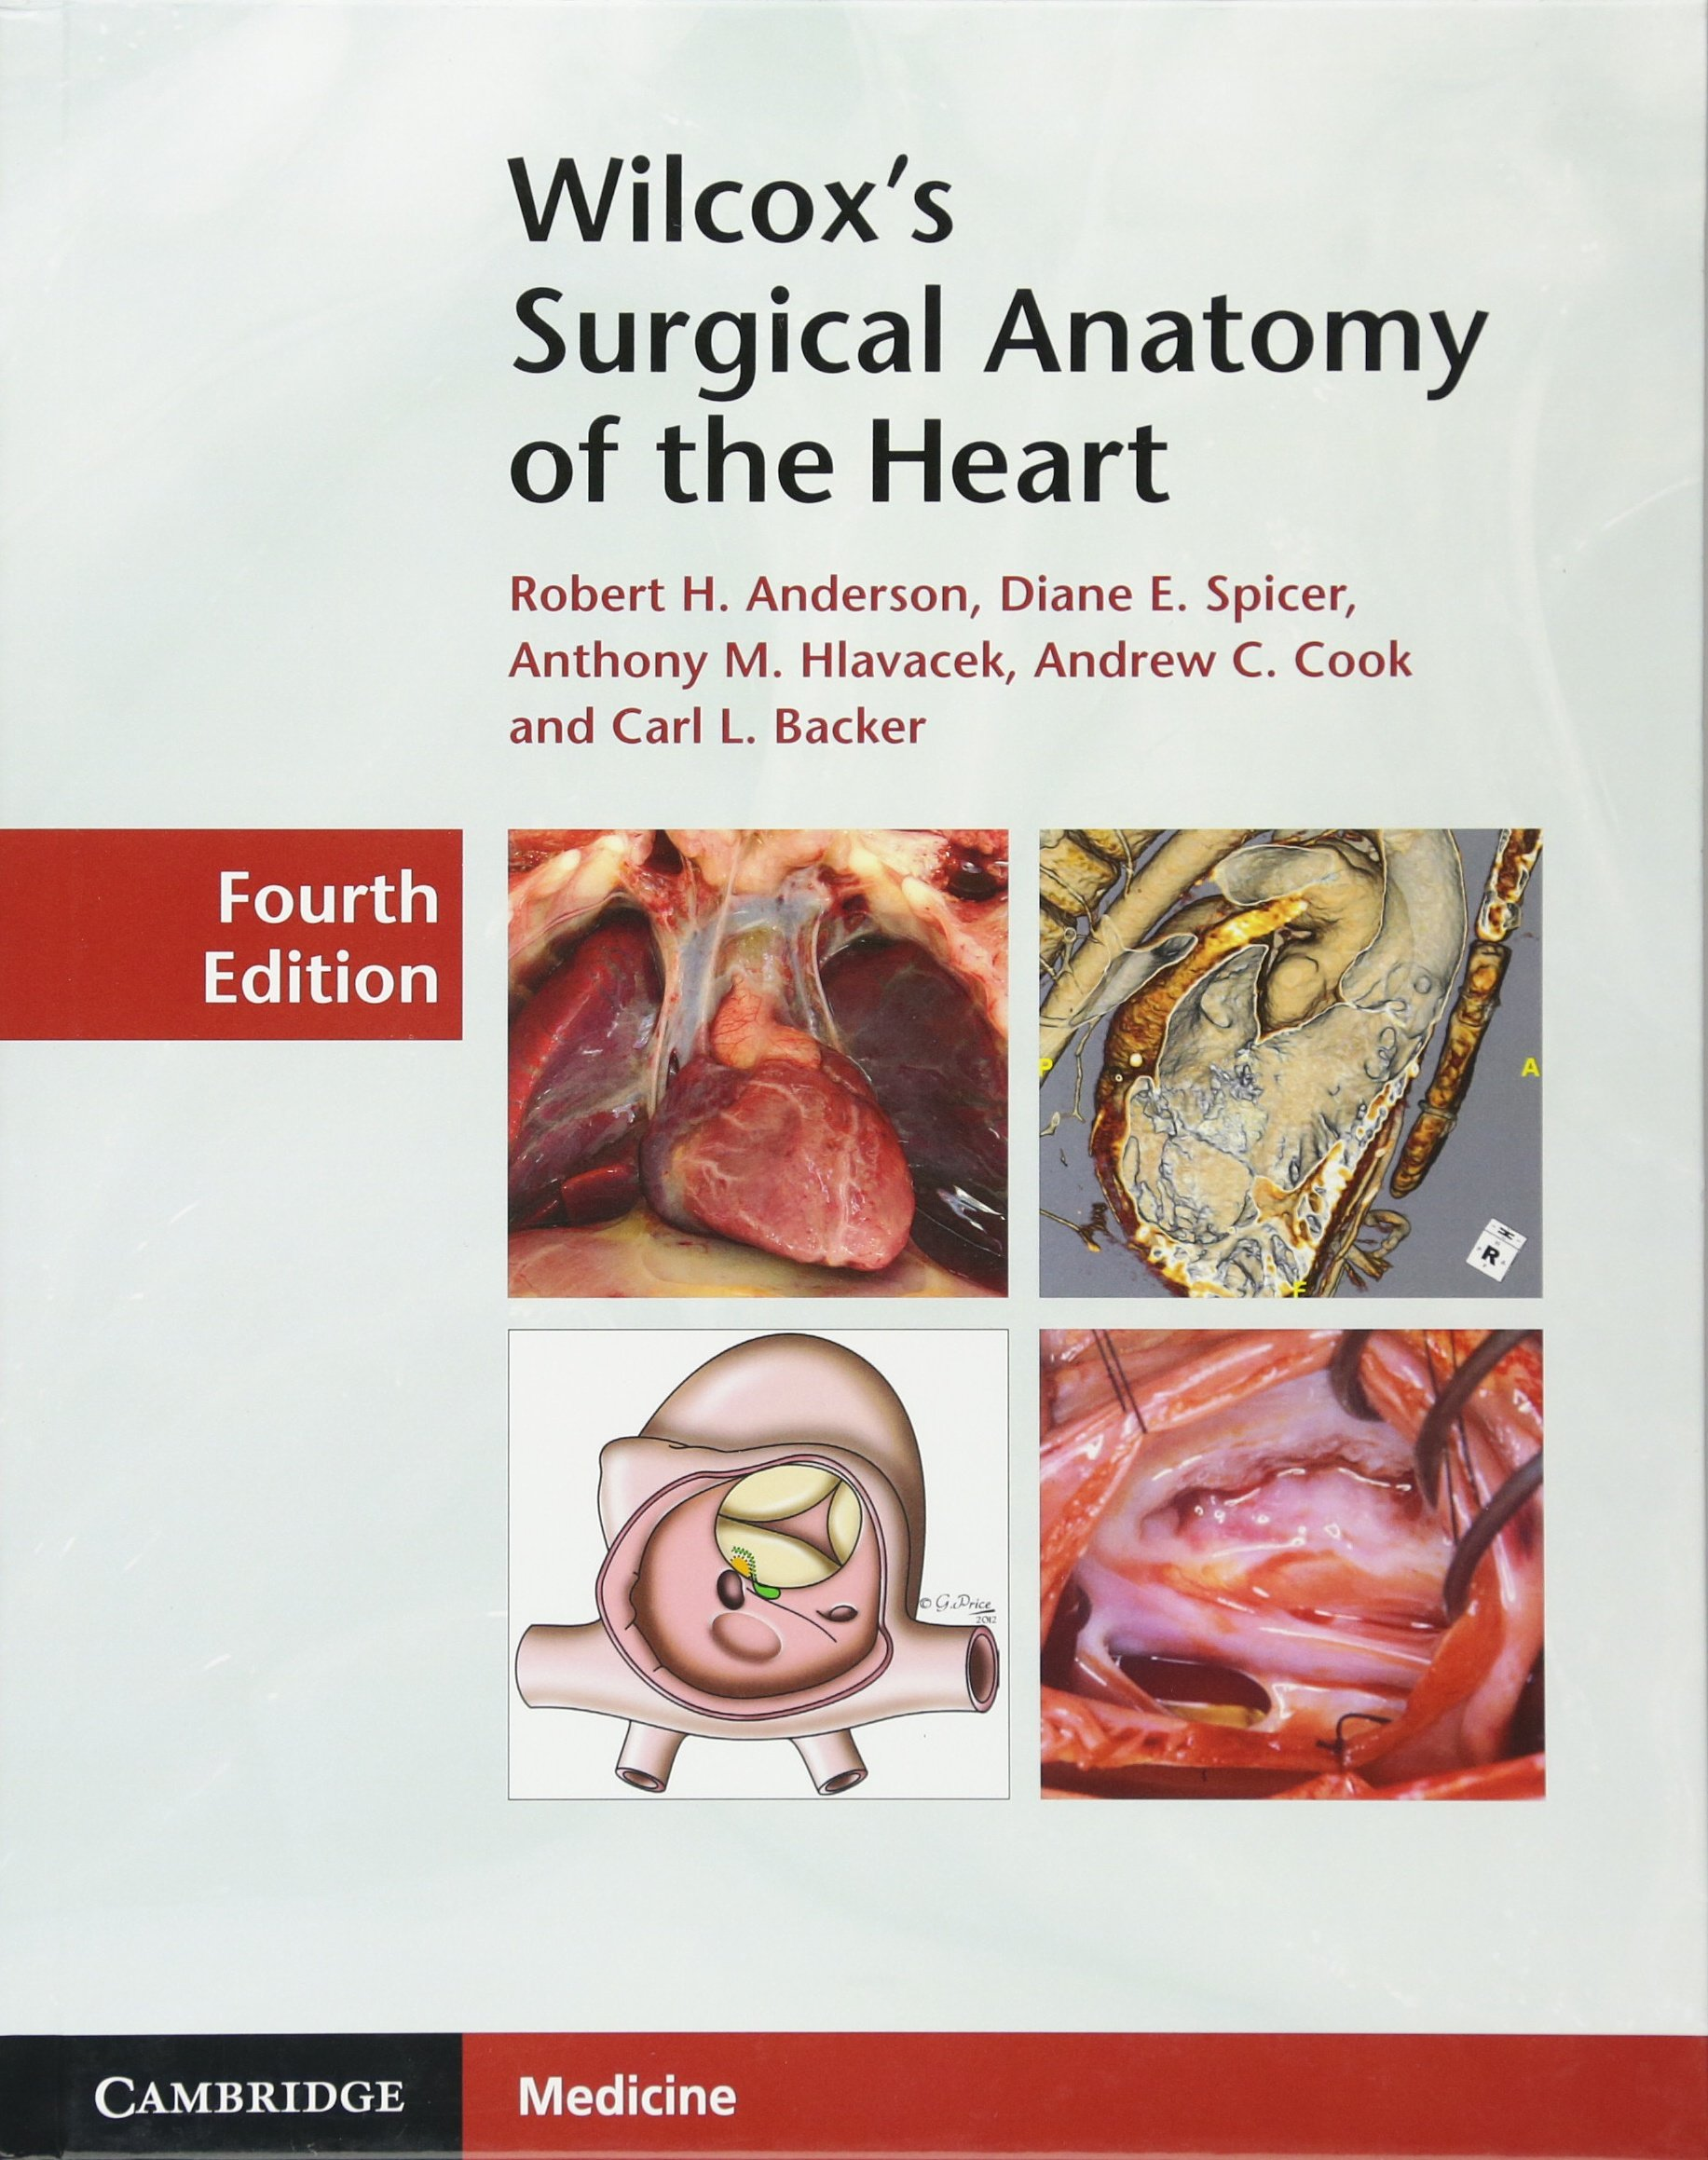 Wilcox\'s Surgical Anatomy of the Heart: Amazon.co.uk: Robert H ...